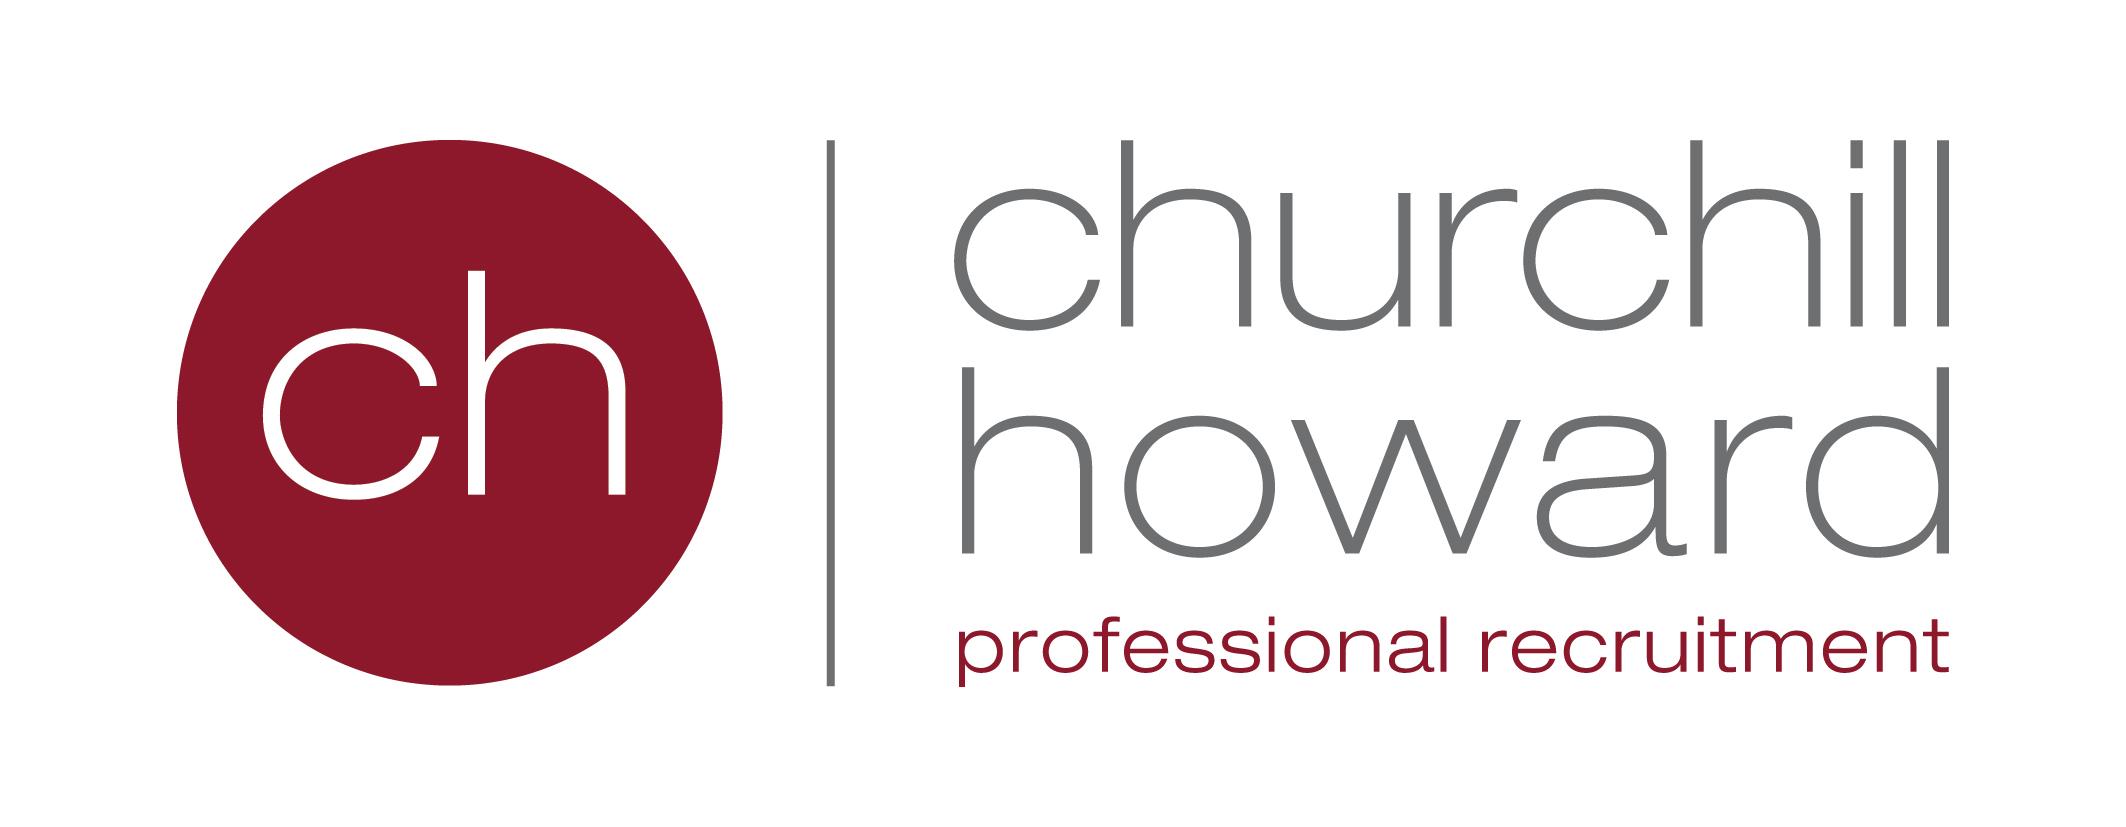 Churchill Howard